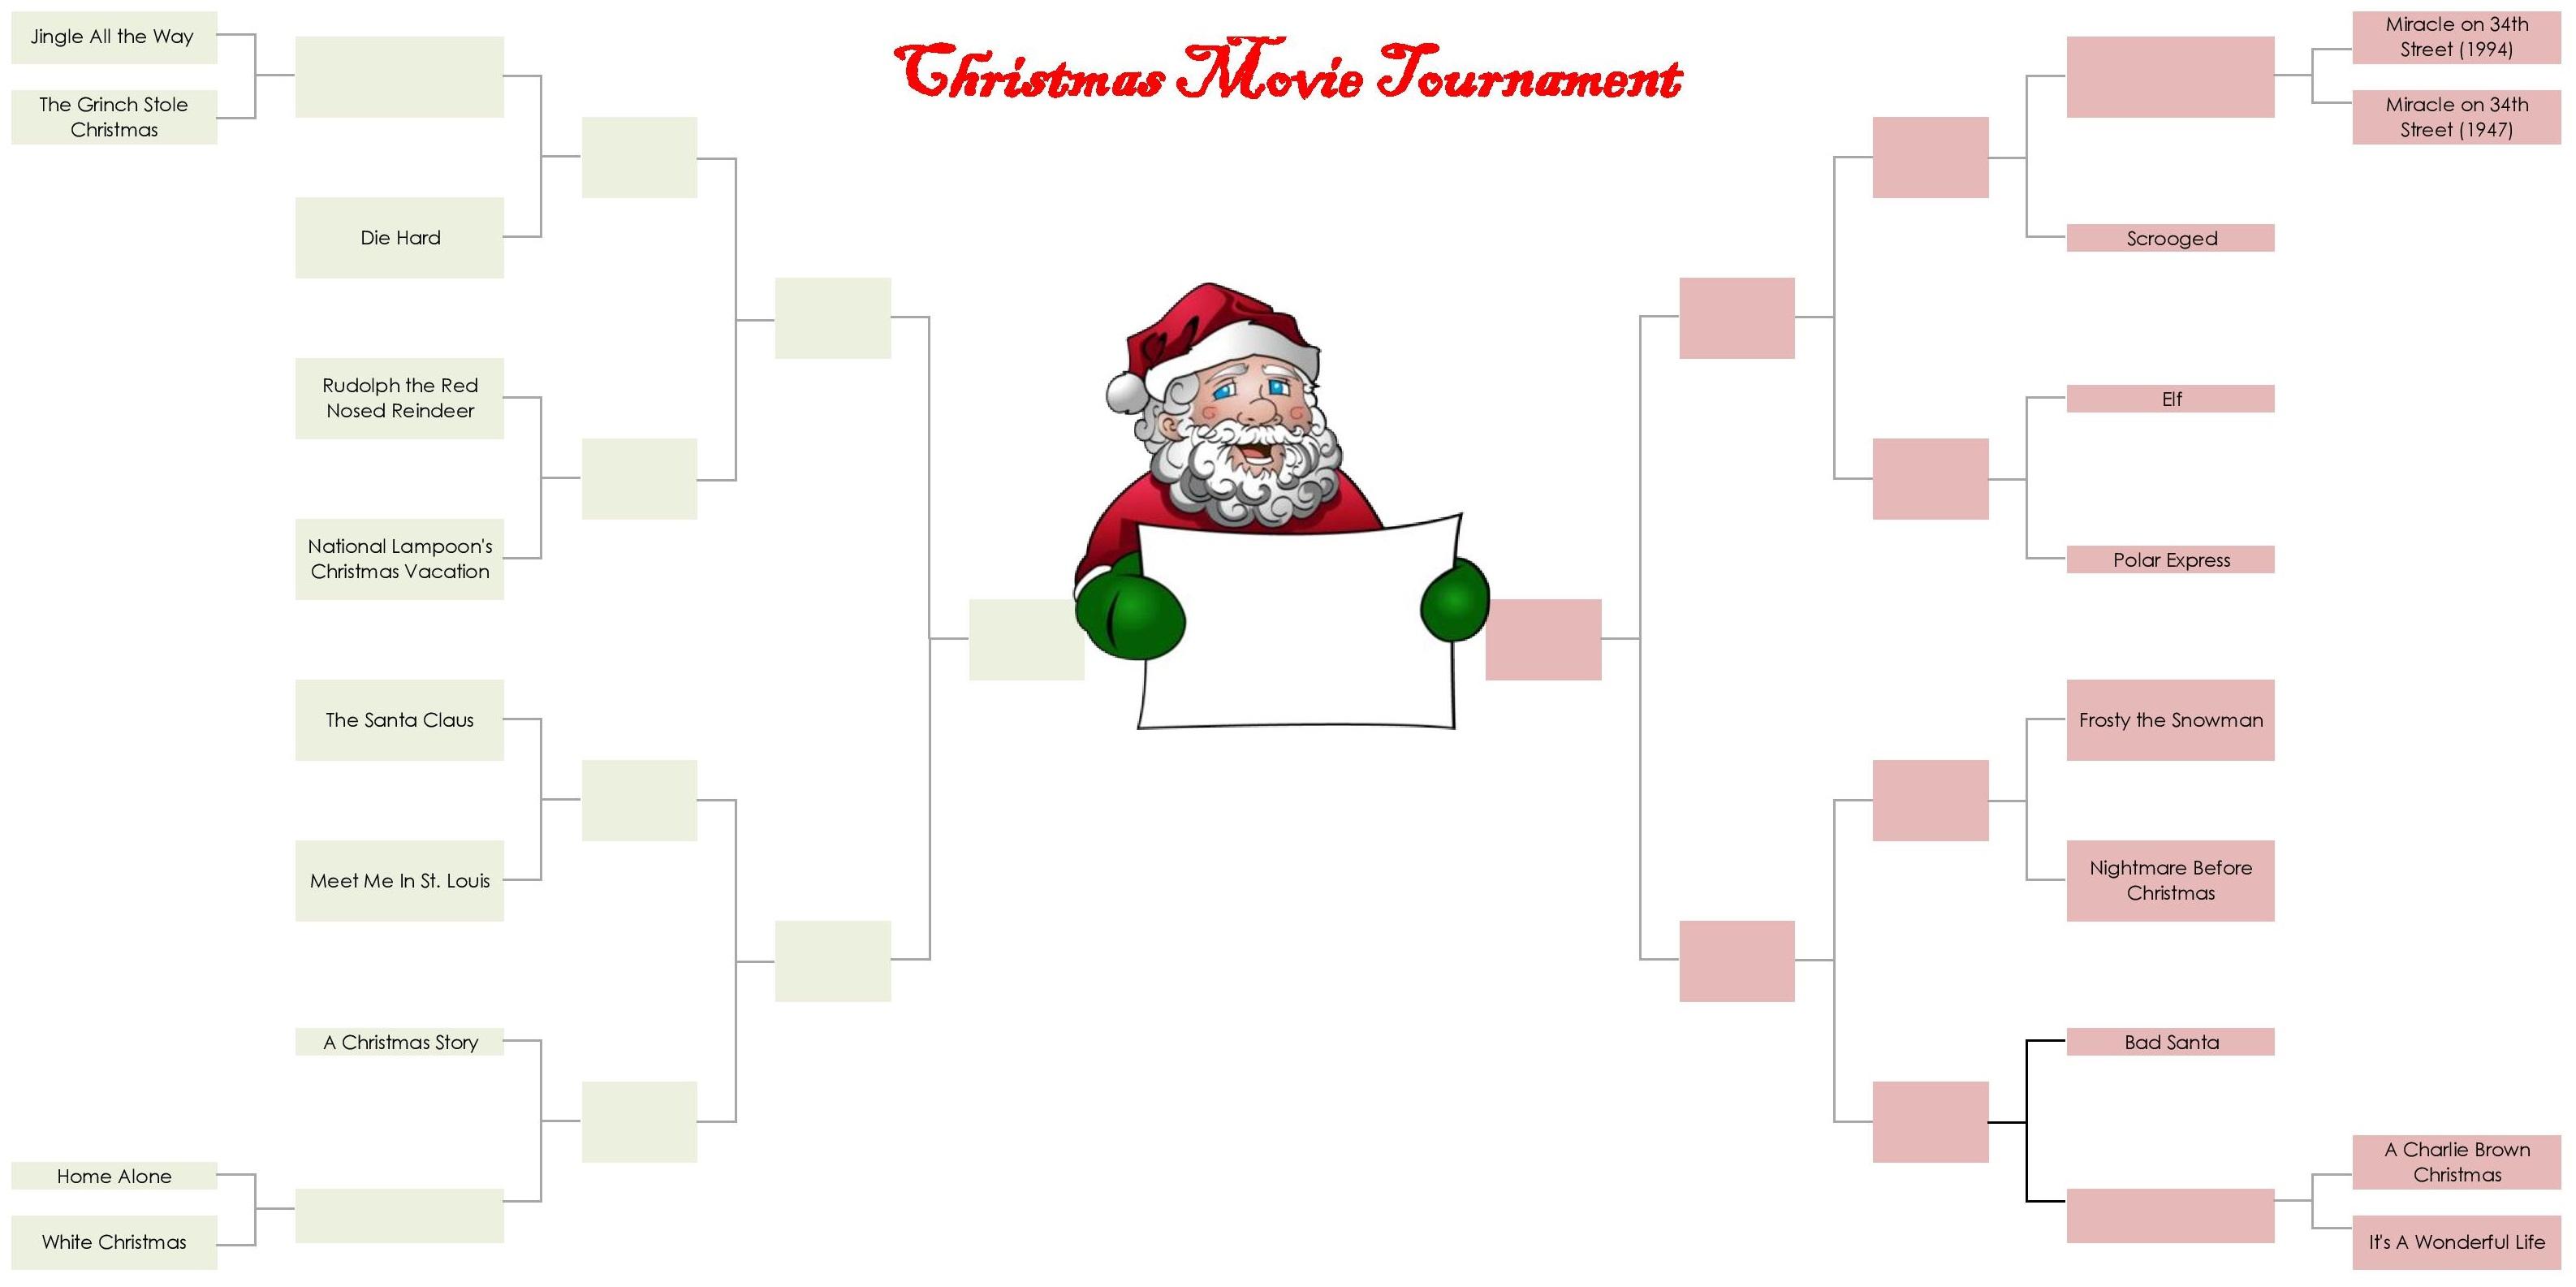 basys-christmas-movie-tournament-v1 - BASYS Processing